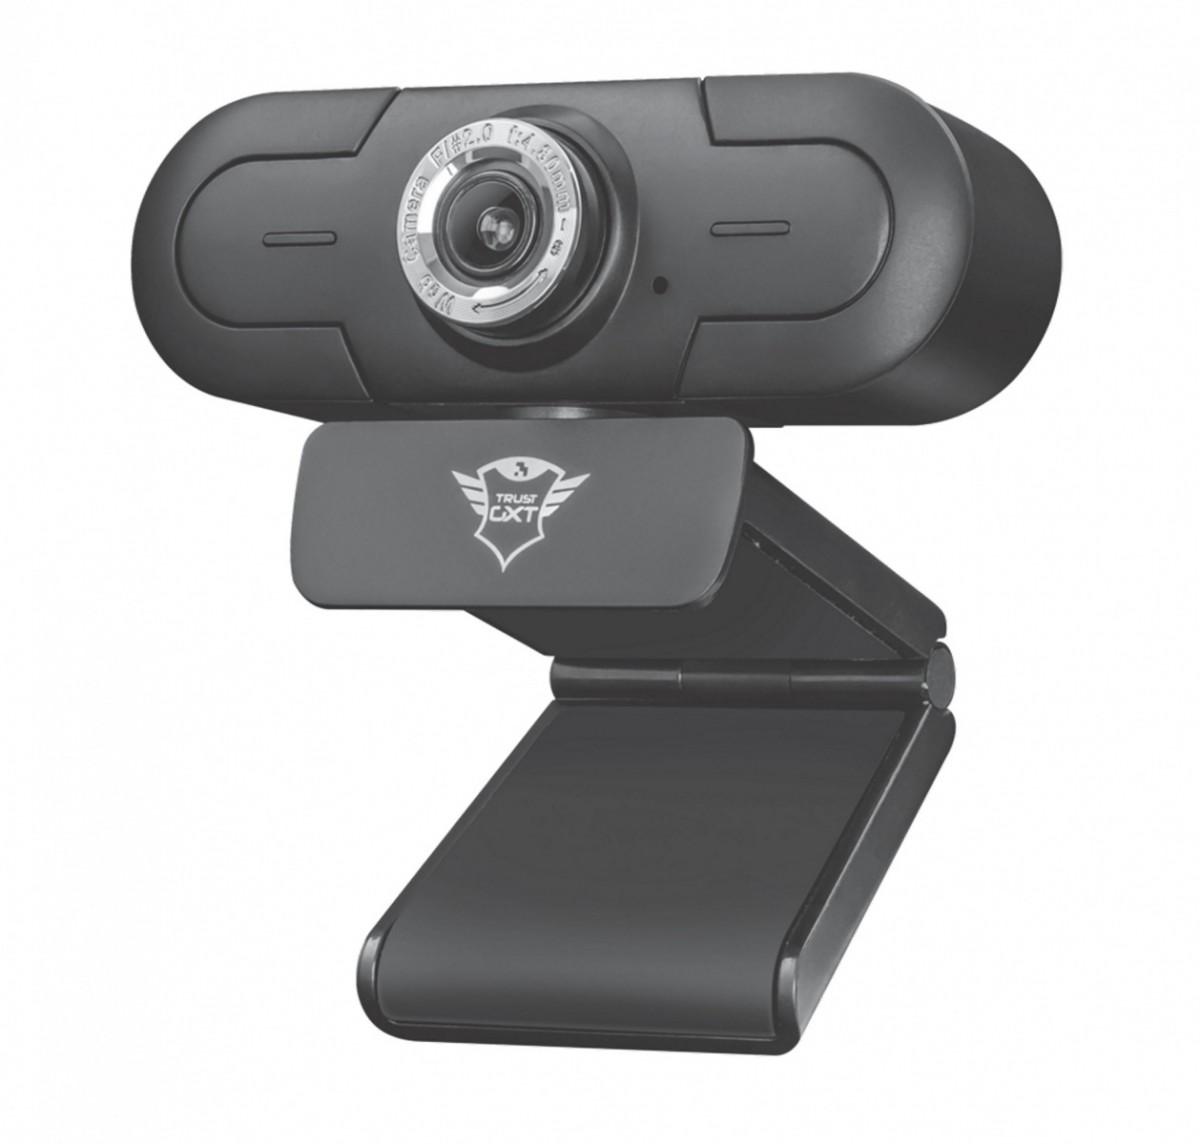 gxt-1170-xper-kamera-internetowa